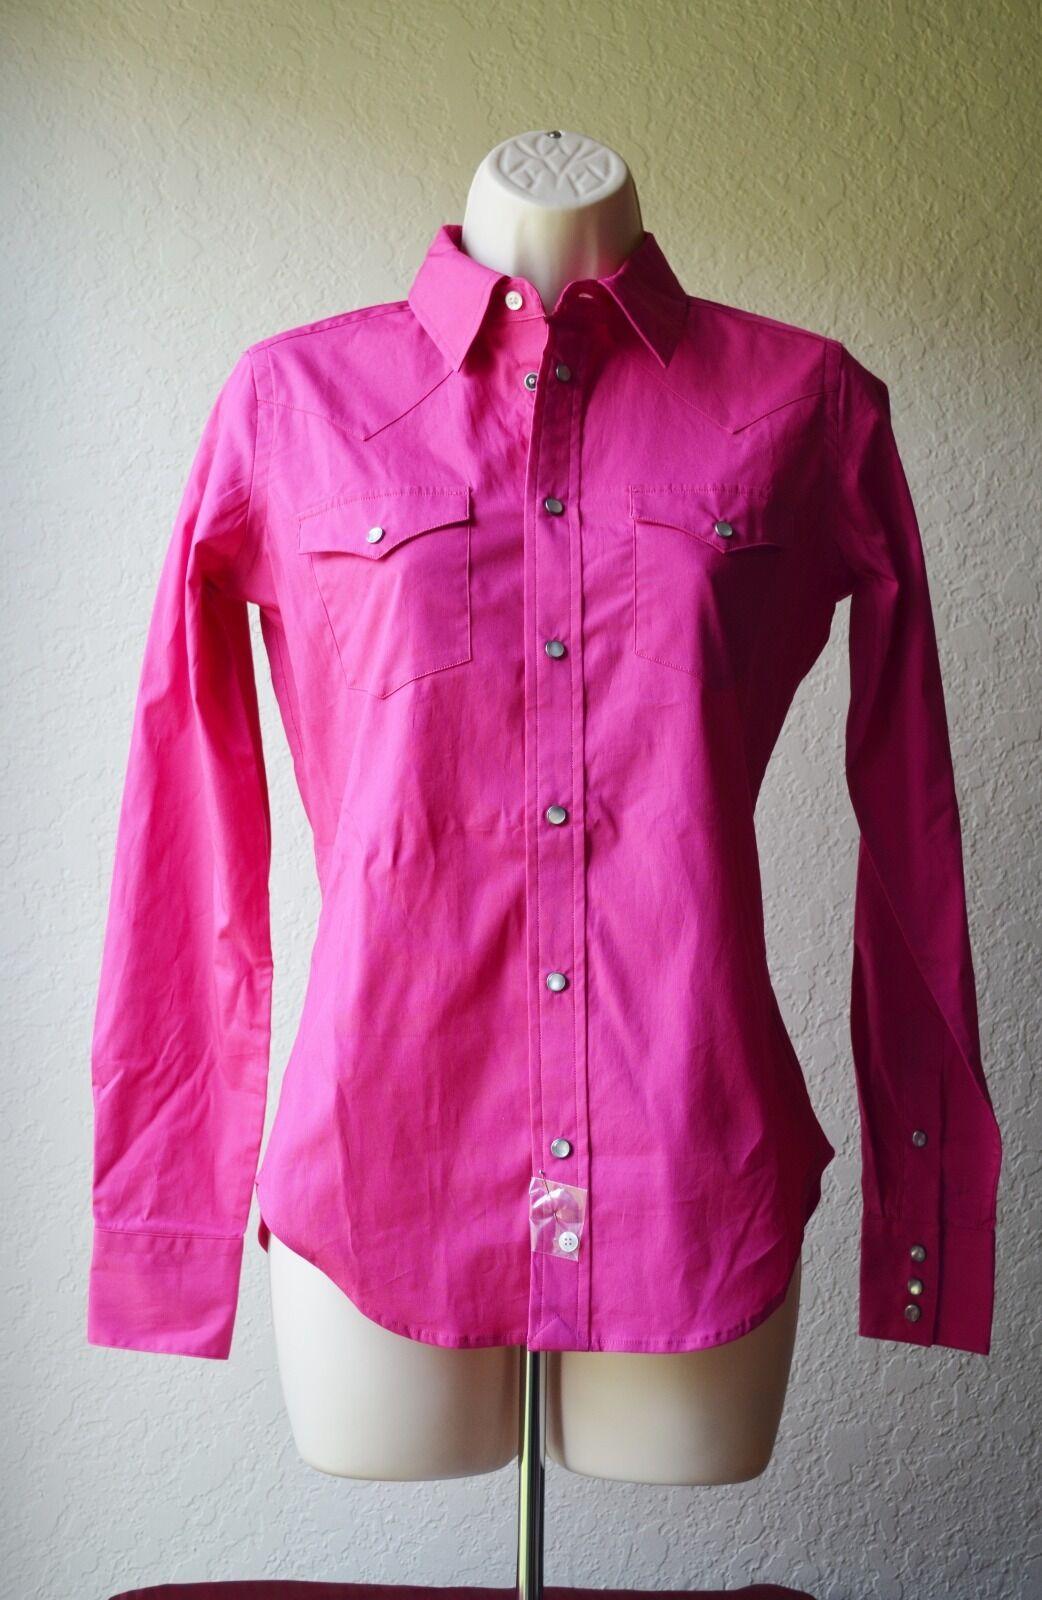 Ralph Lauren 100% Authentic Pink Button Down Shirt Women Size 2 MSRP  165